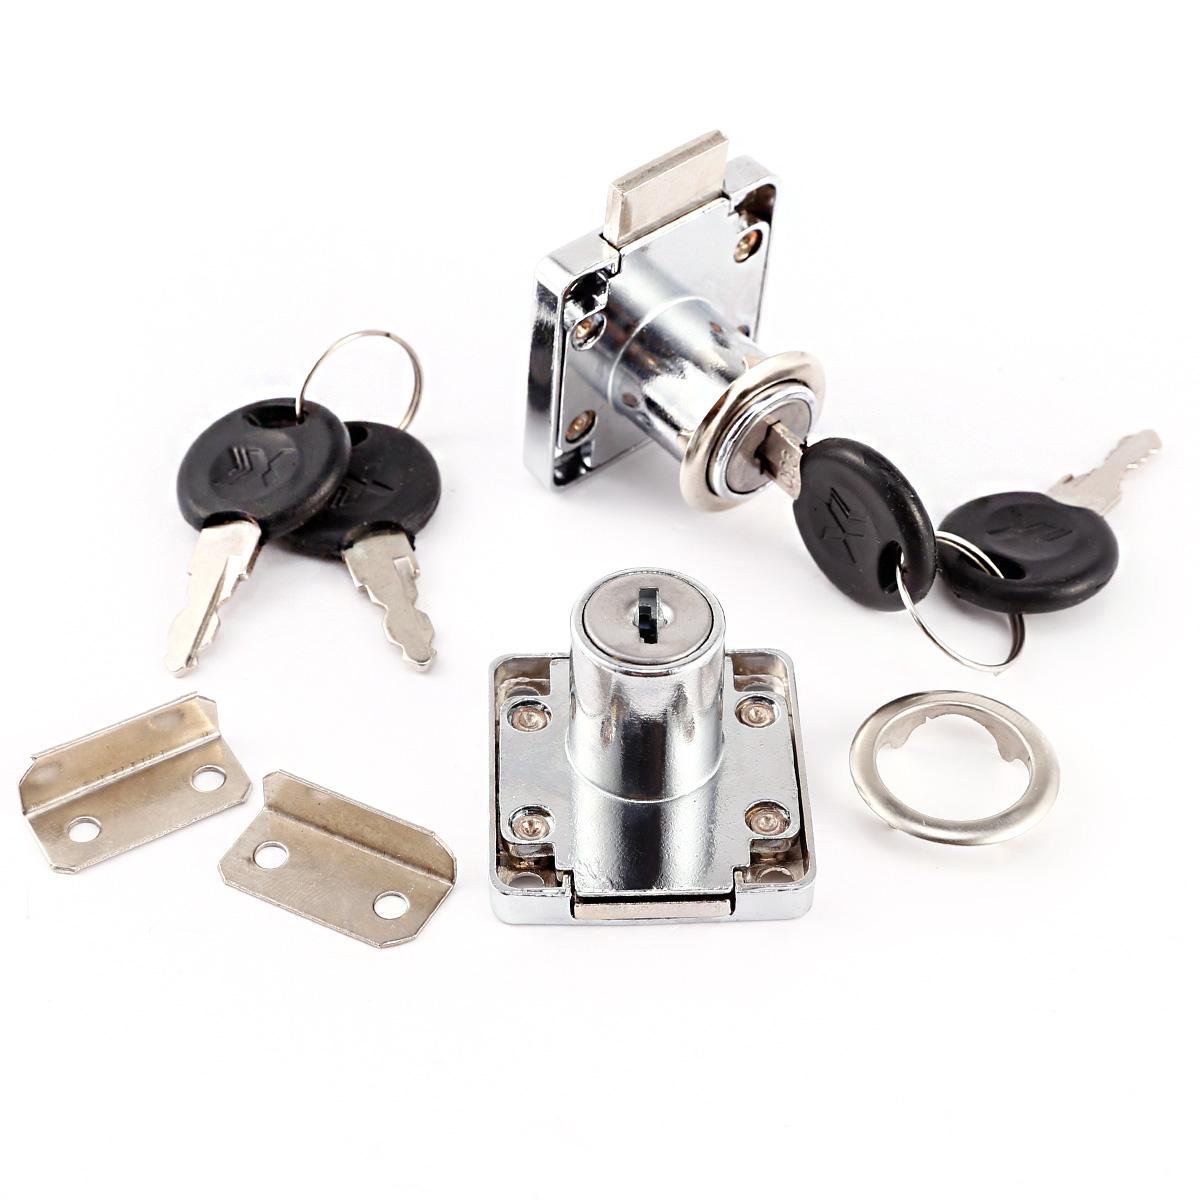 10X 30mm 2 Keyed Tubular Cam Lock For RV Camper Drawer File Cabinet Toolbox